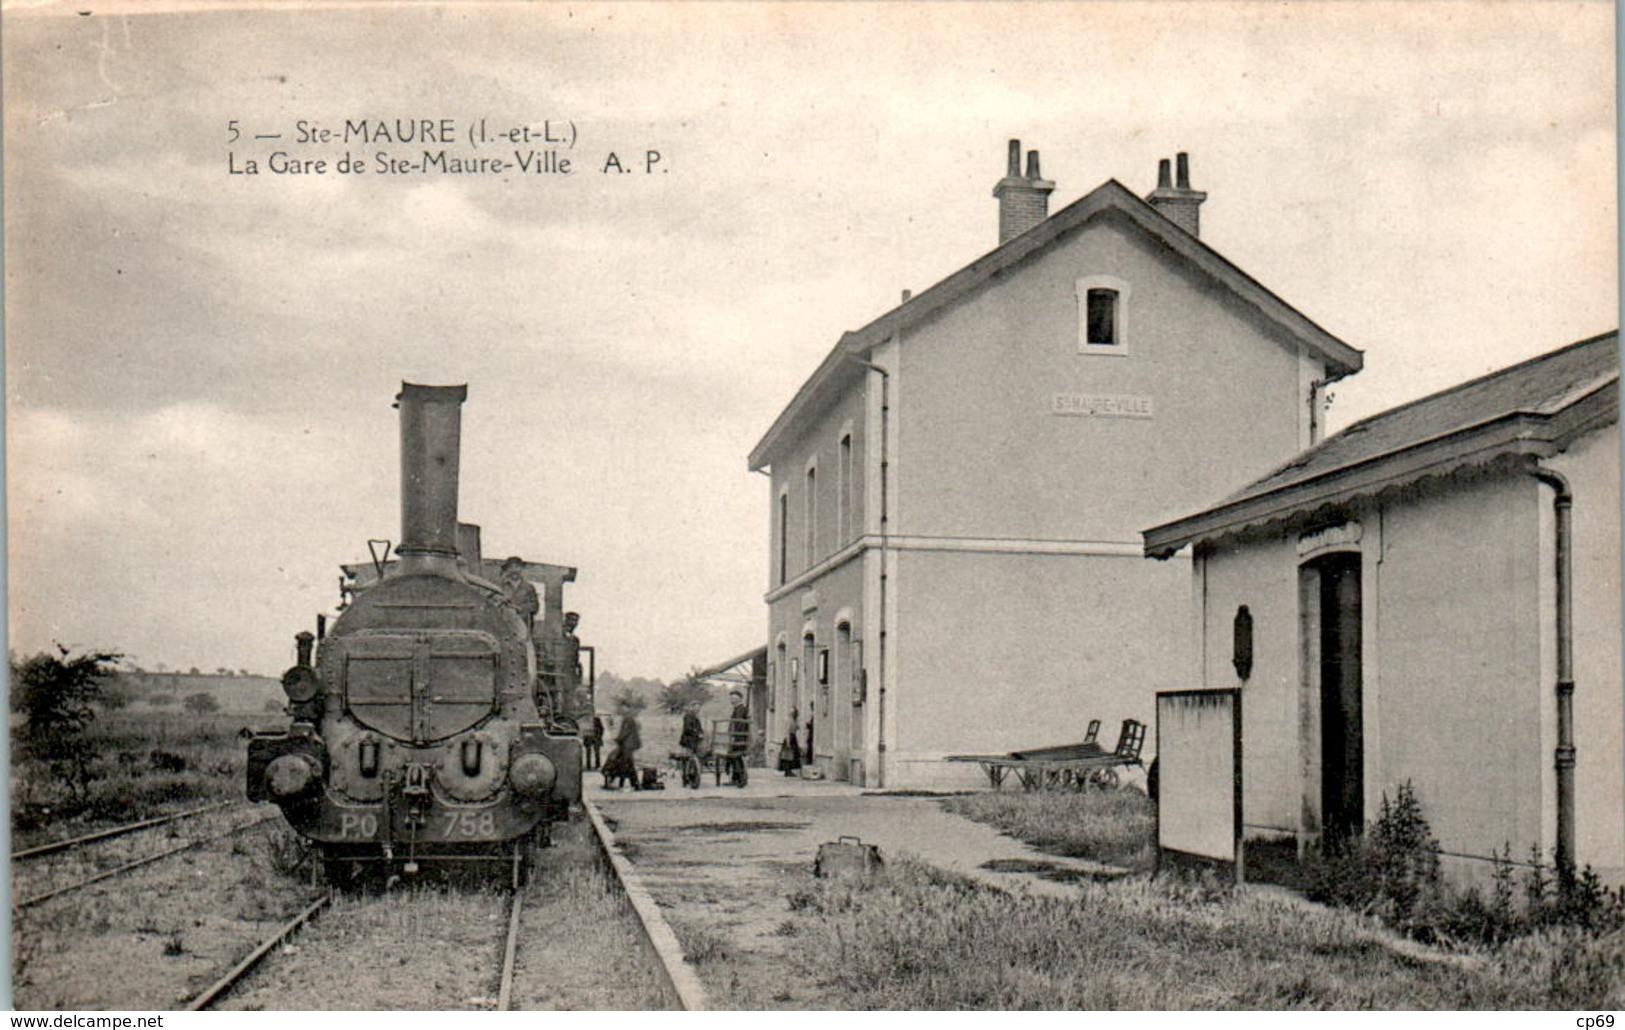 STE-MAURE - Gare De Ste-Maure-Ville The Train Station Locomotive - INDRE-ET-LOIRE N°5 Dos Vert Superbe.Etat - Francia